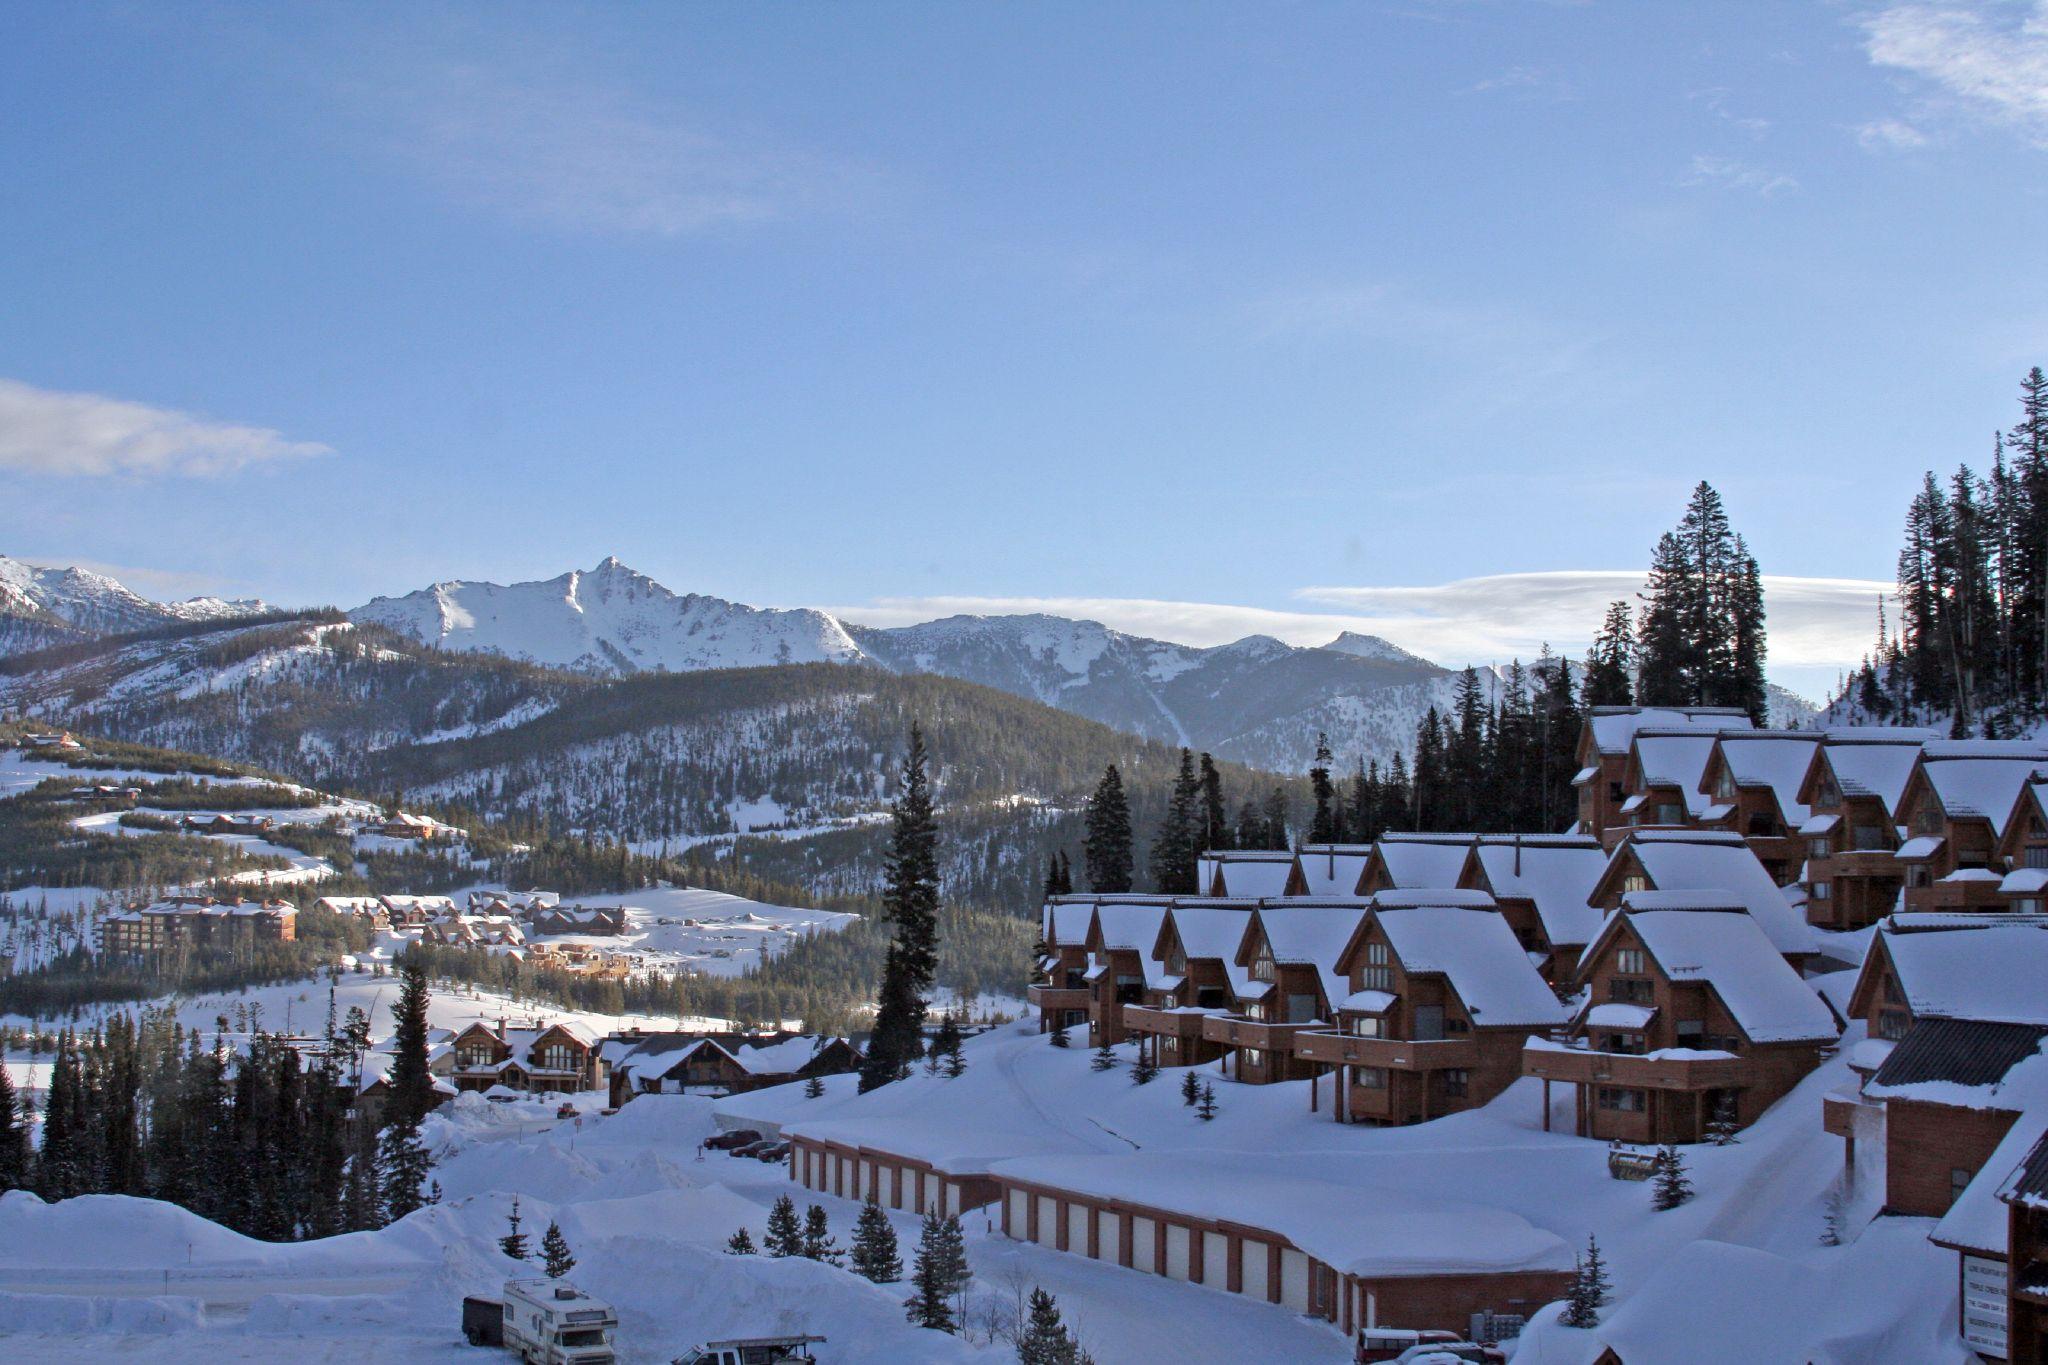 Rogers Pass – Montana, USA